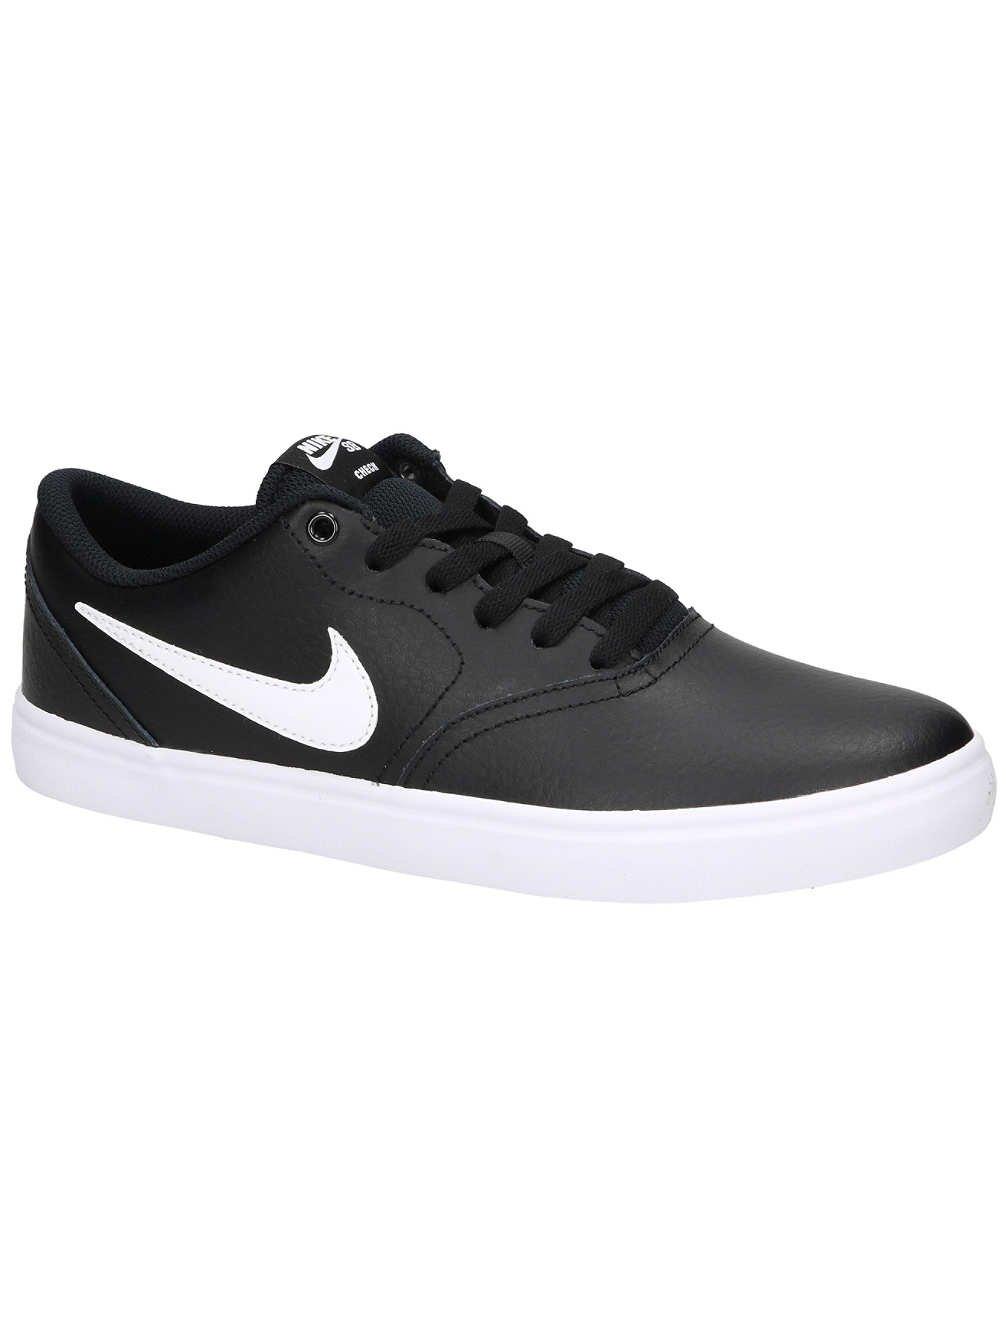 NIKE SB Check Solarsoft Leather Unisex Skate Shoes Black/White (11.5 D US)